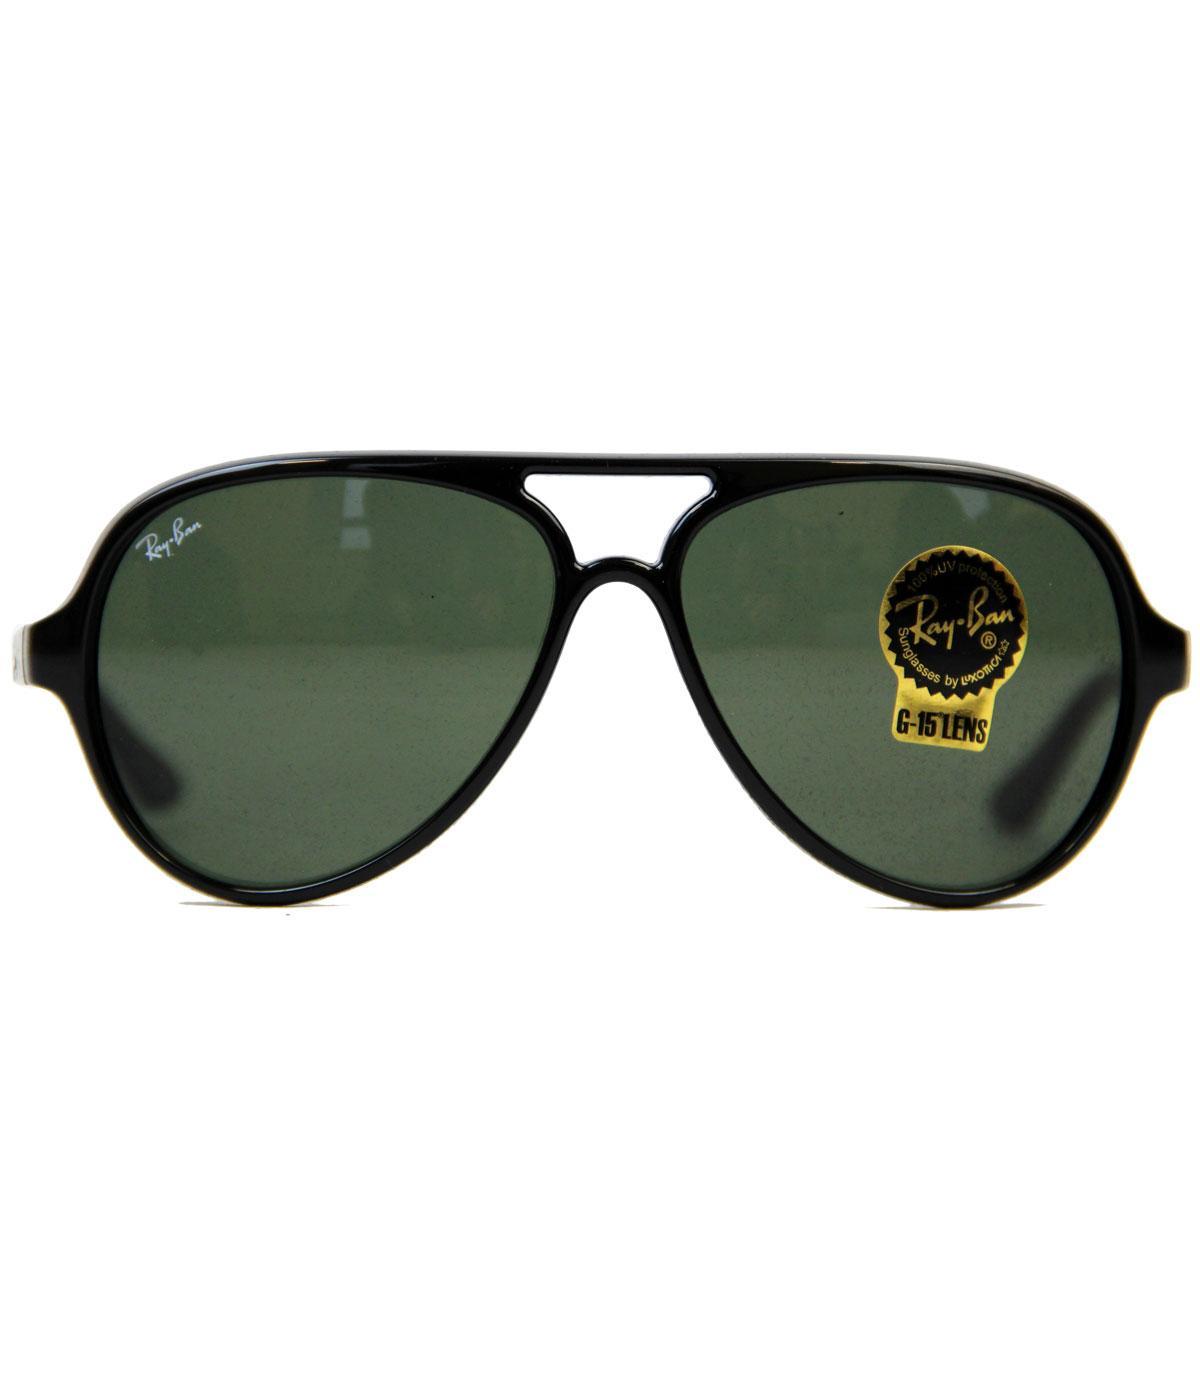 Cats 5000 Ray-Ban Retro Mod Aviator Sunglasses -Bl